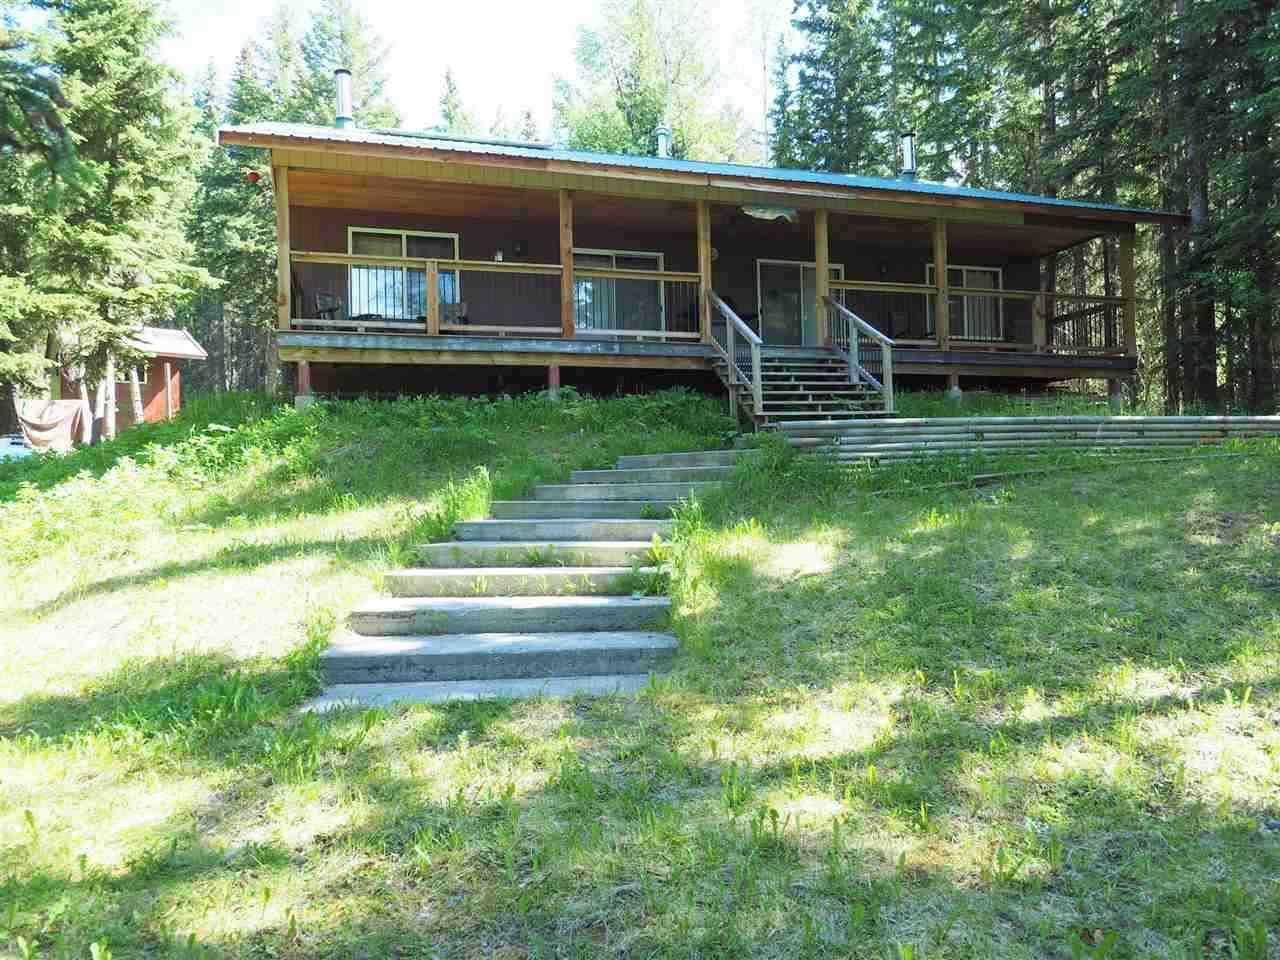 Photo 32: Photos: 8222 CENTENNIAL Road in Bridge Lake: Bridge Lake/Sheridan Lake House for sale (100 Mile House (Zone 10))  : MLS®# R2457362